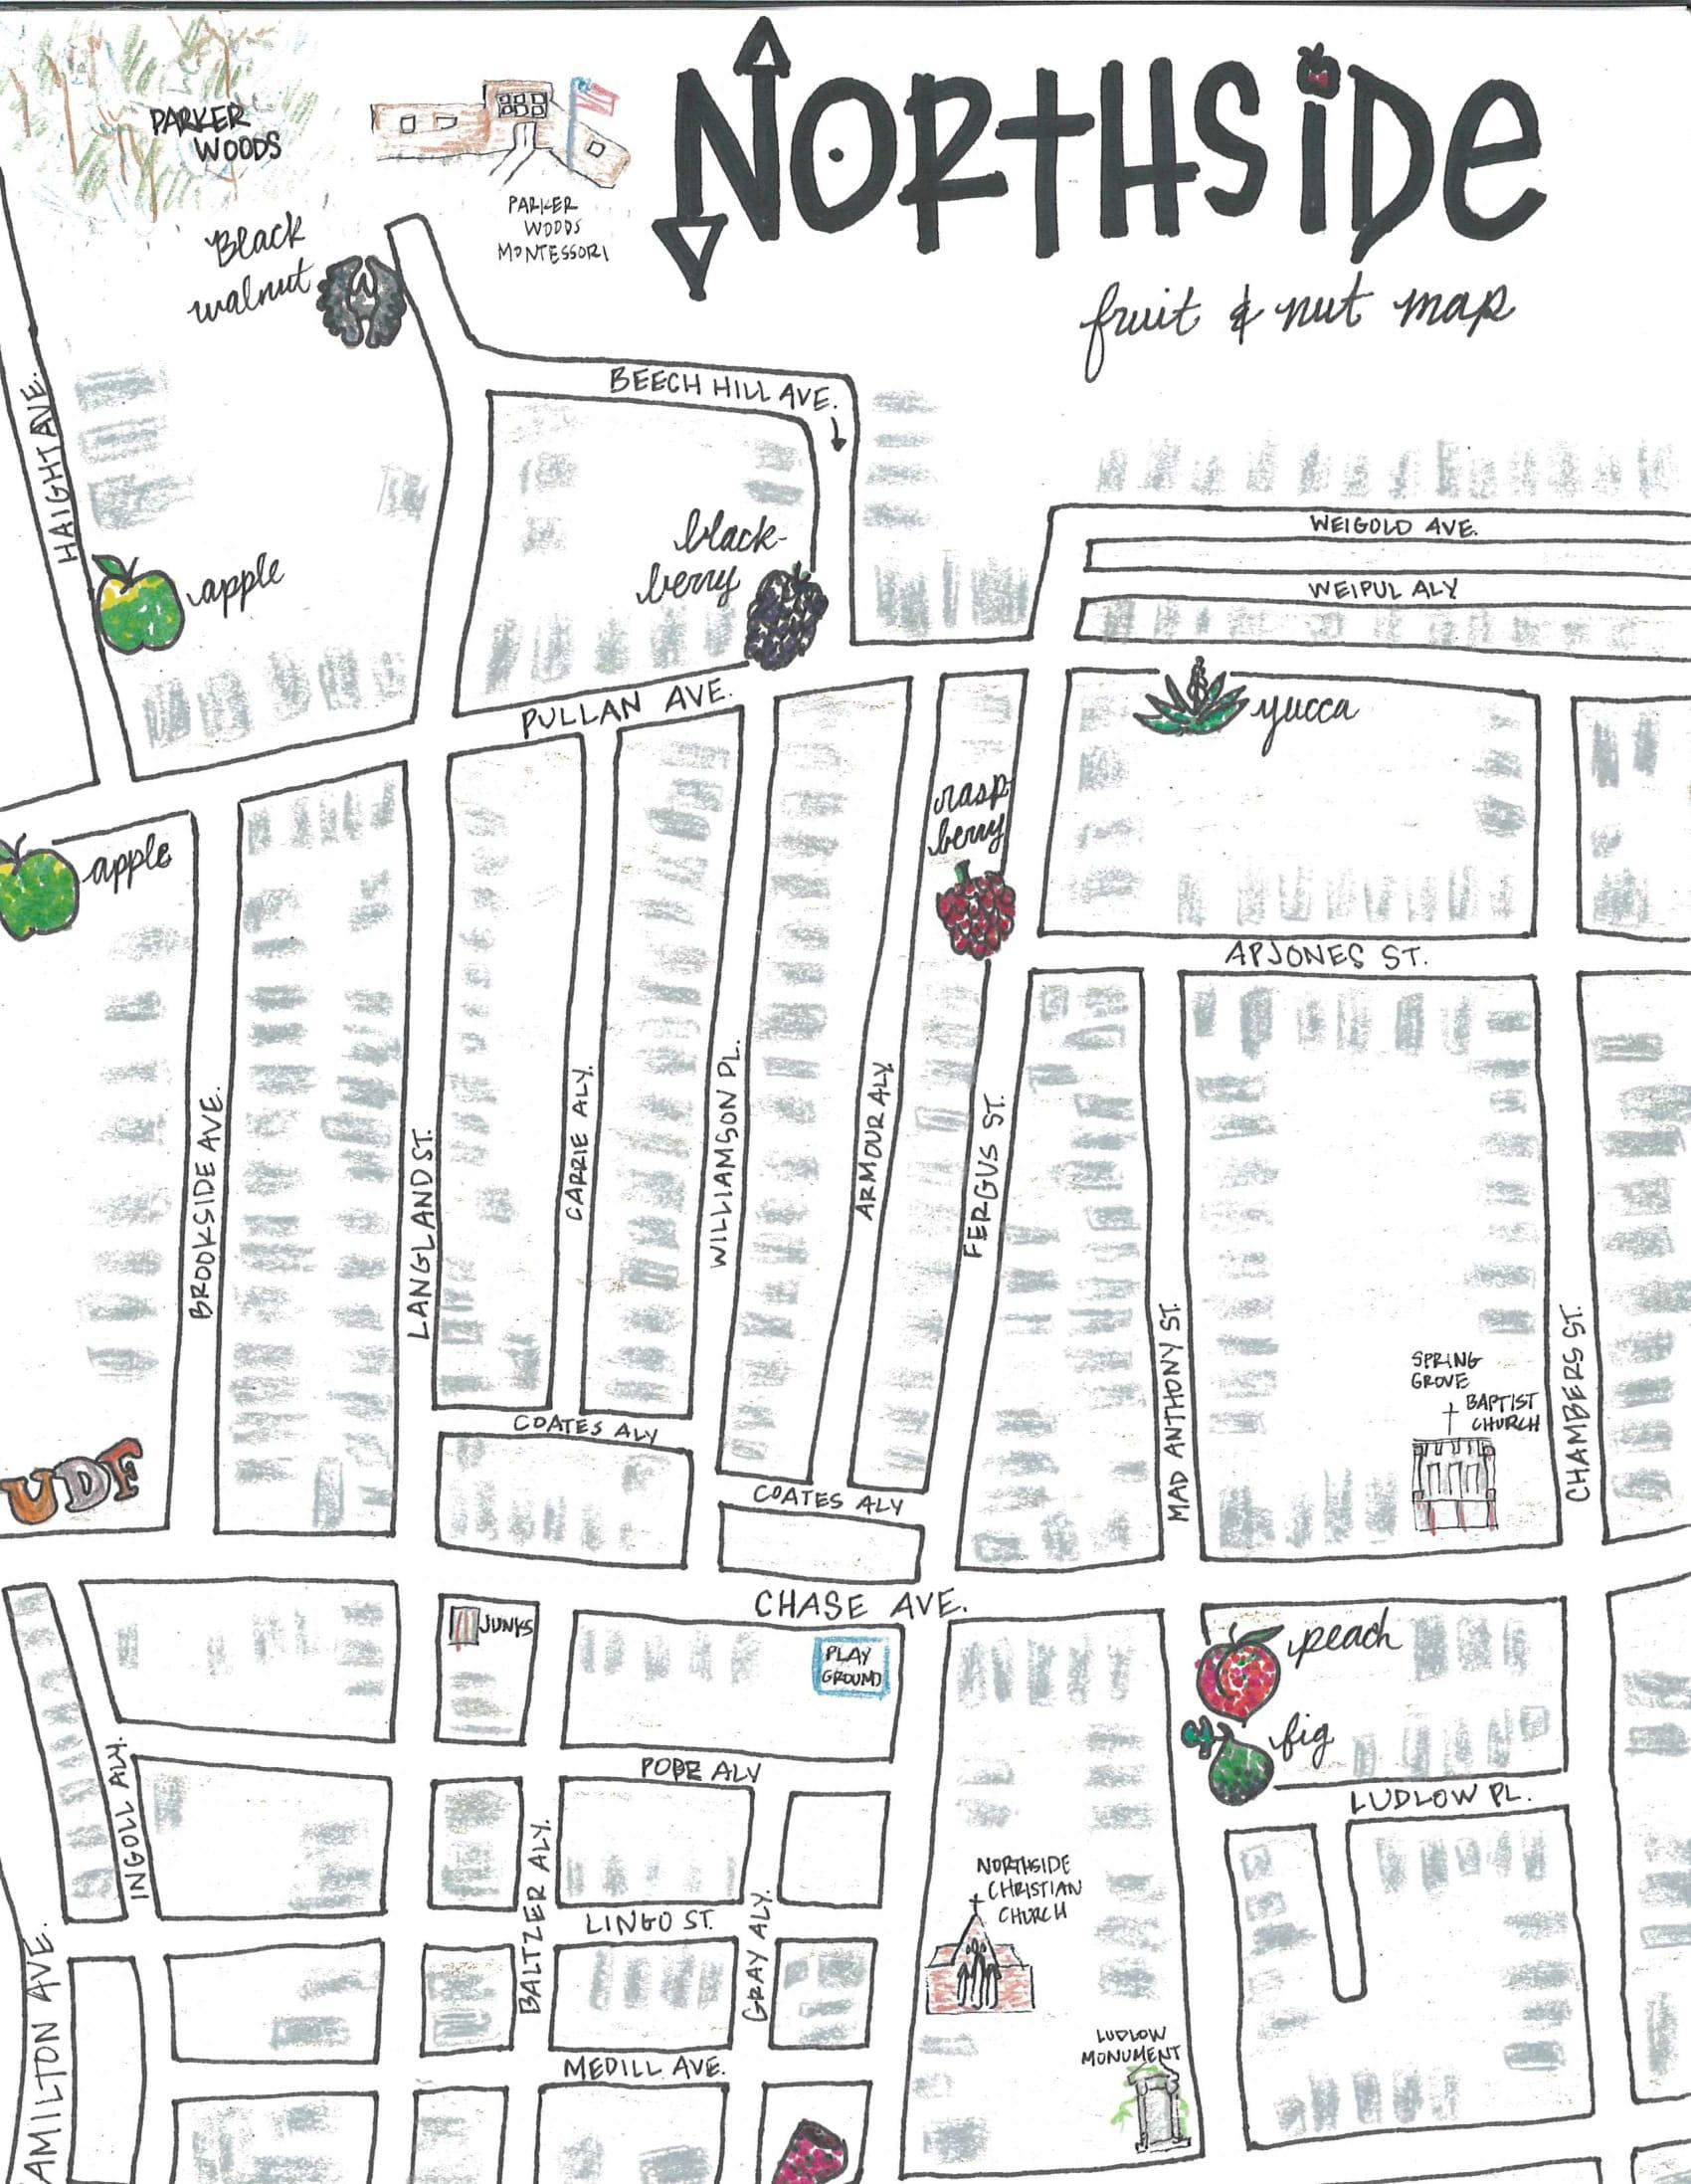 2-Northside-Food-Map-Rose-CSCTC-16-1.jpg